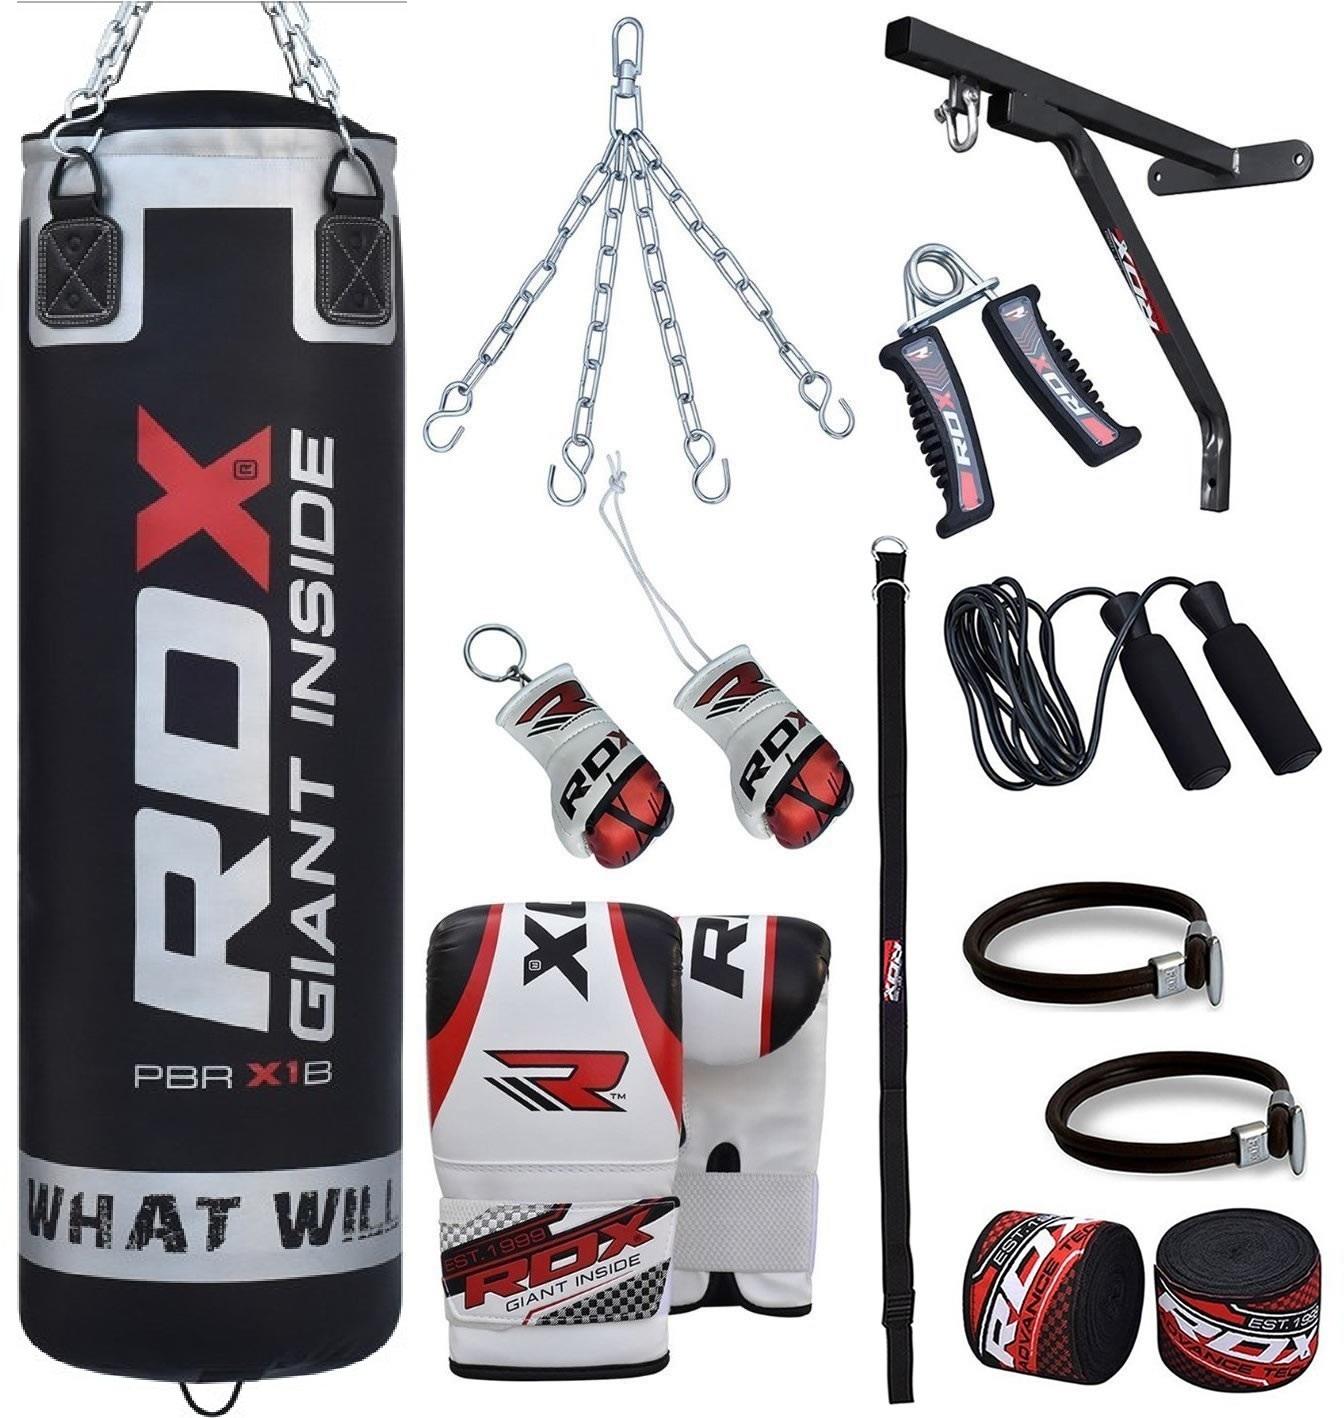 Груши Набор боксера RDX 17PC Punch Bag 5ft 1.jpg